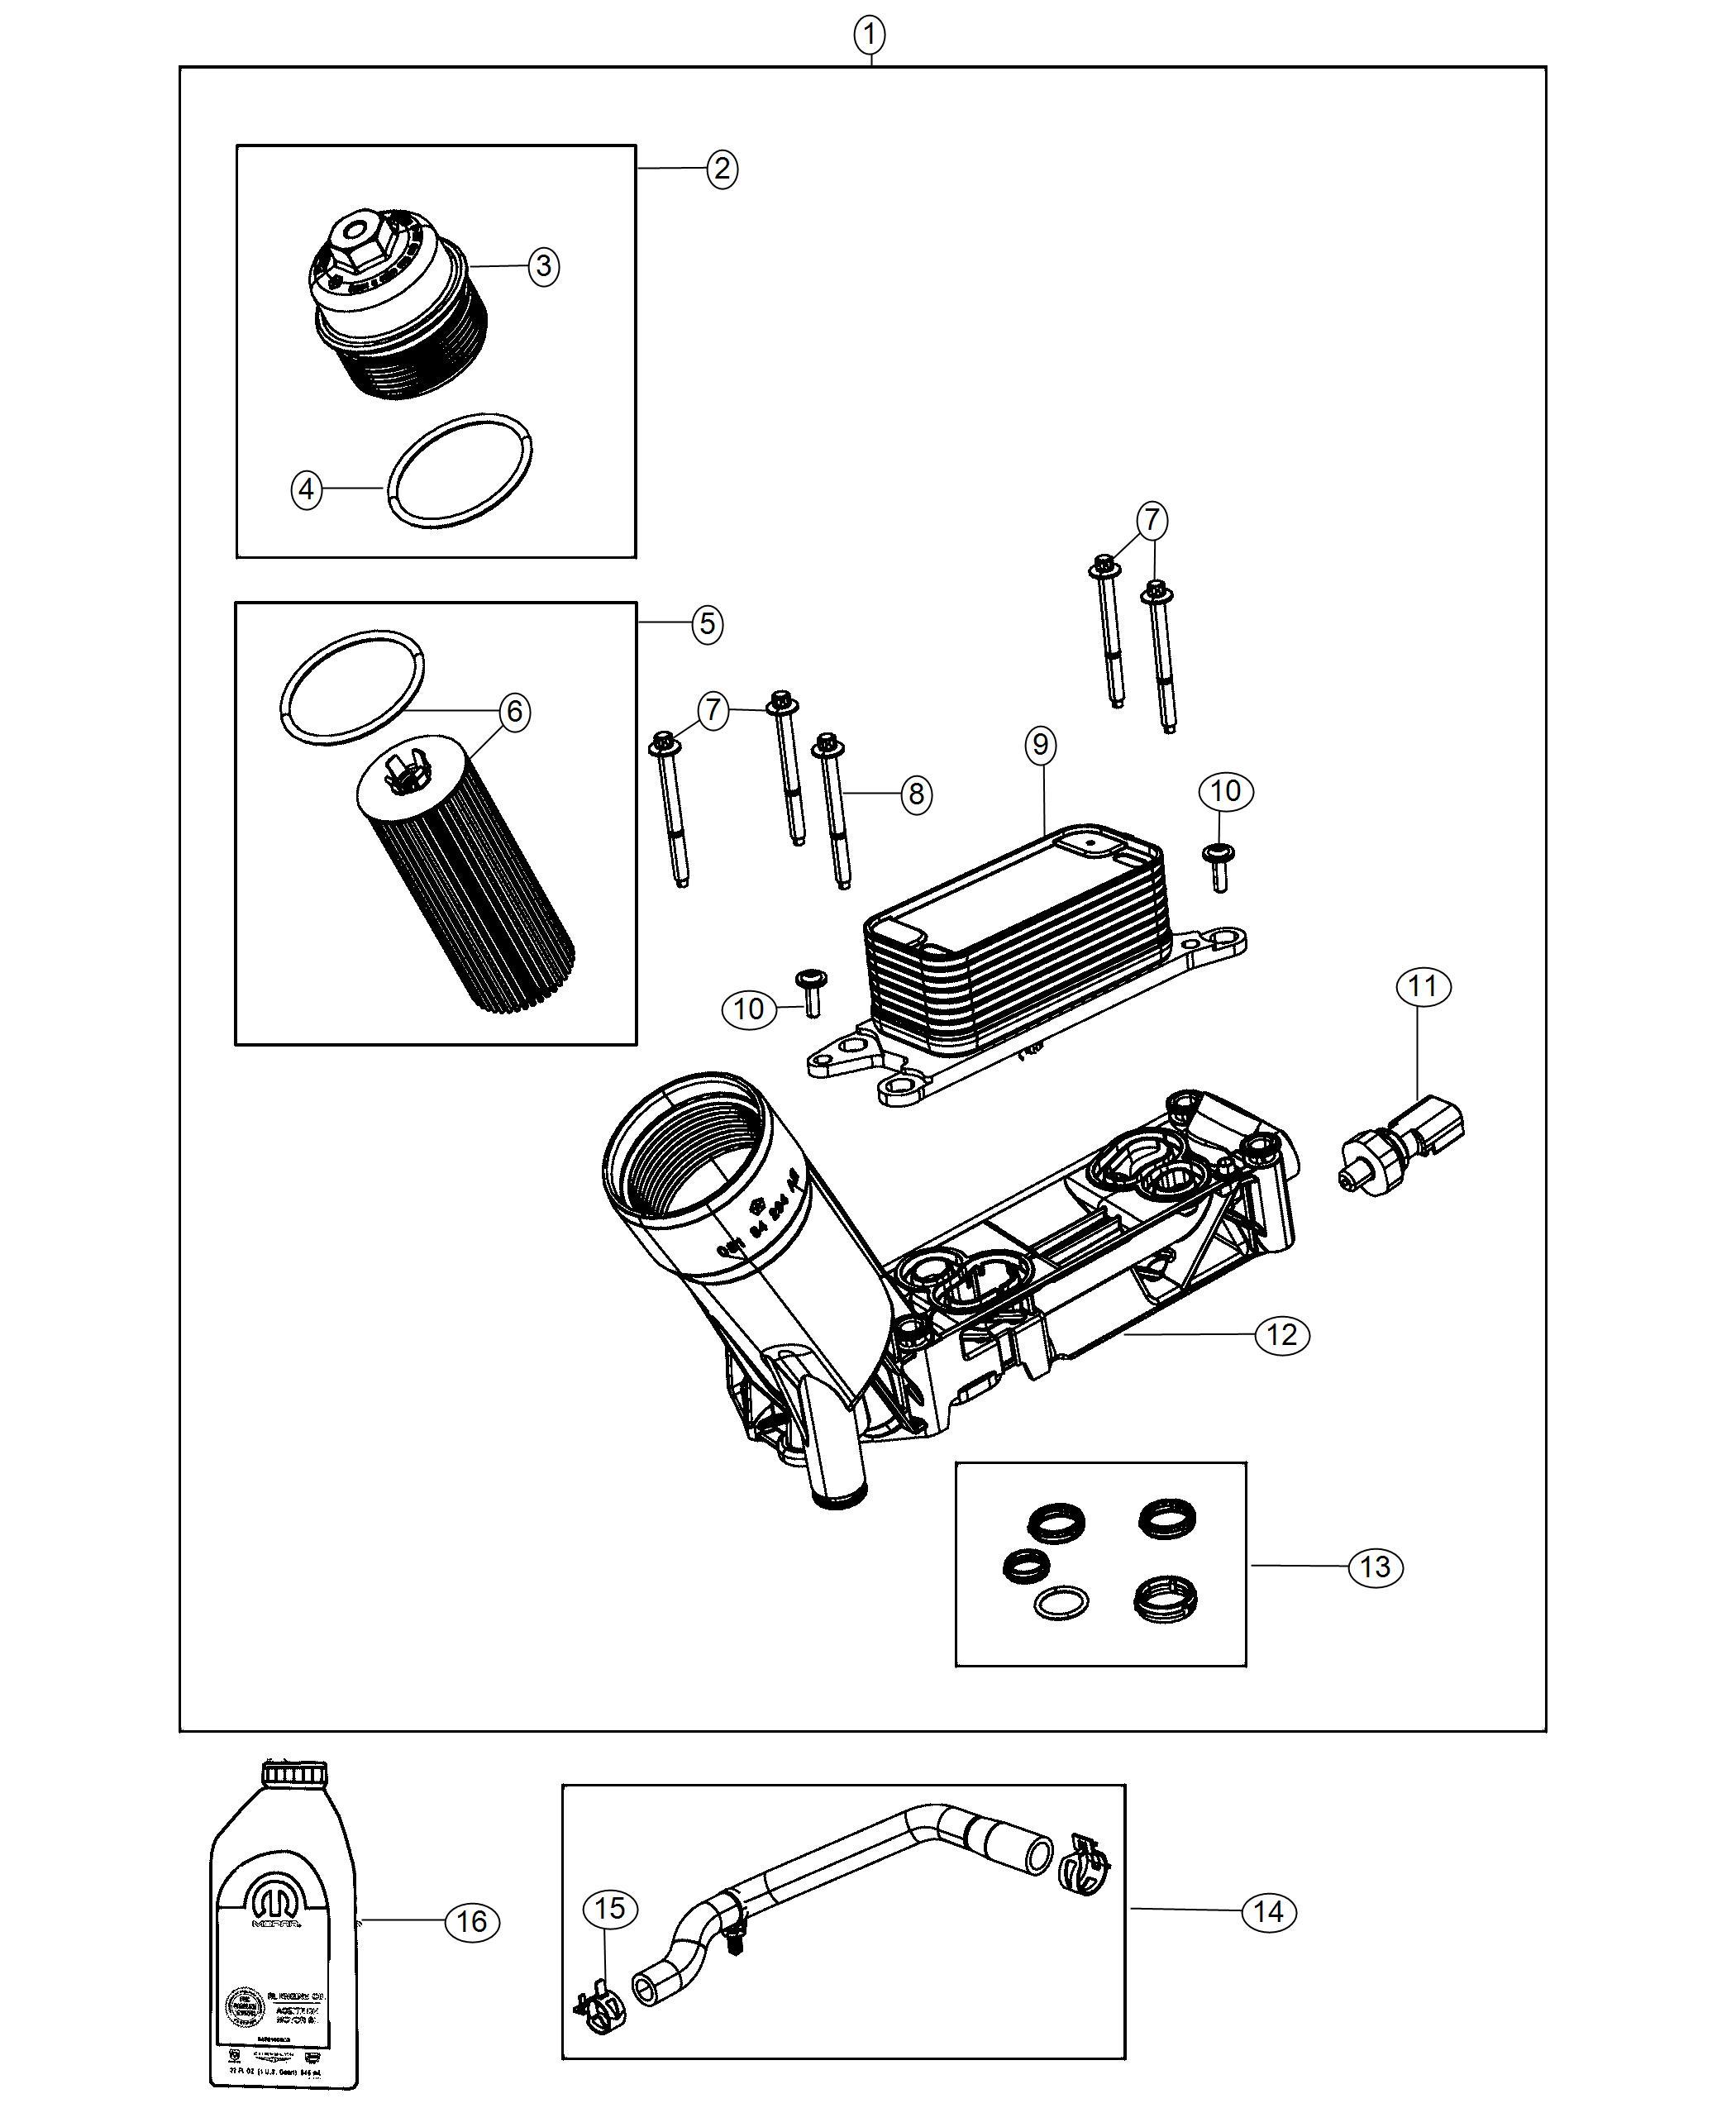 Dodge Durango Sensor Oil Pressure Engine Oil Cooler